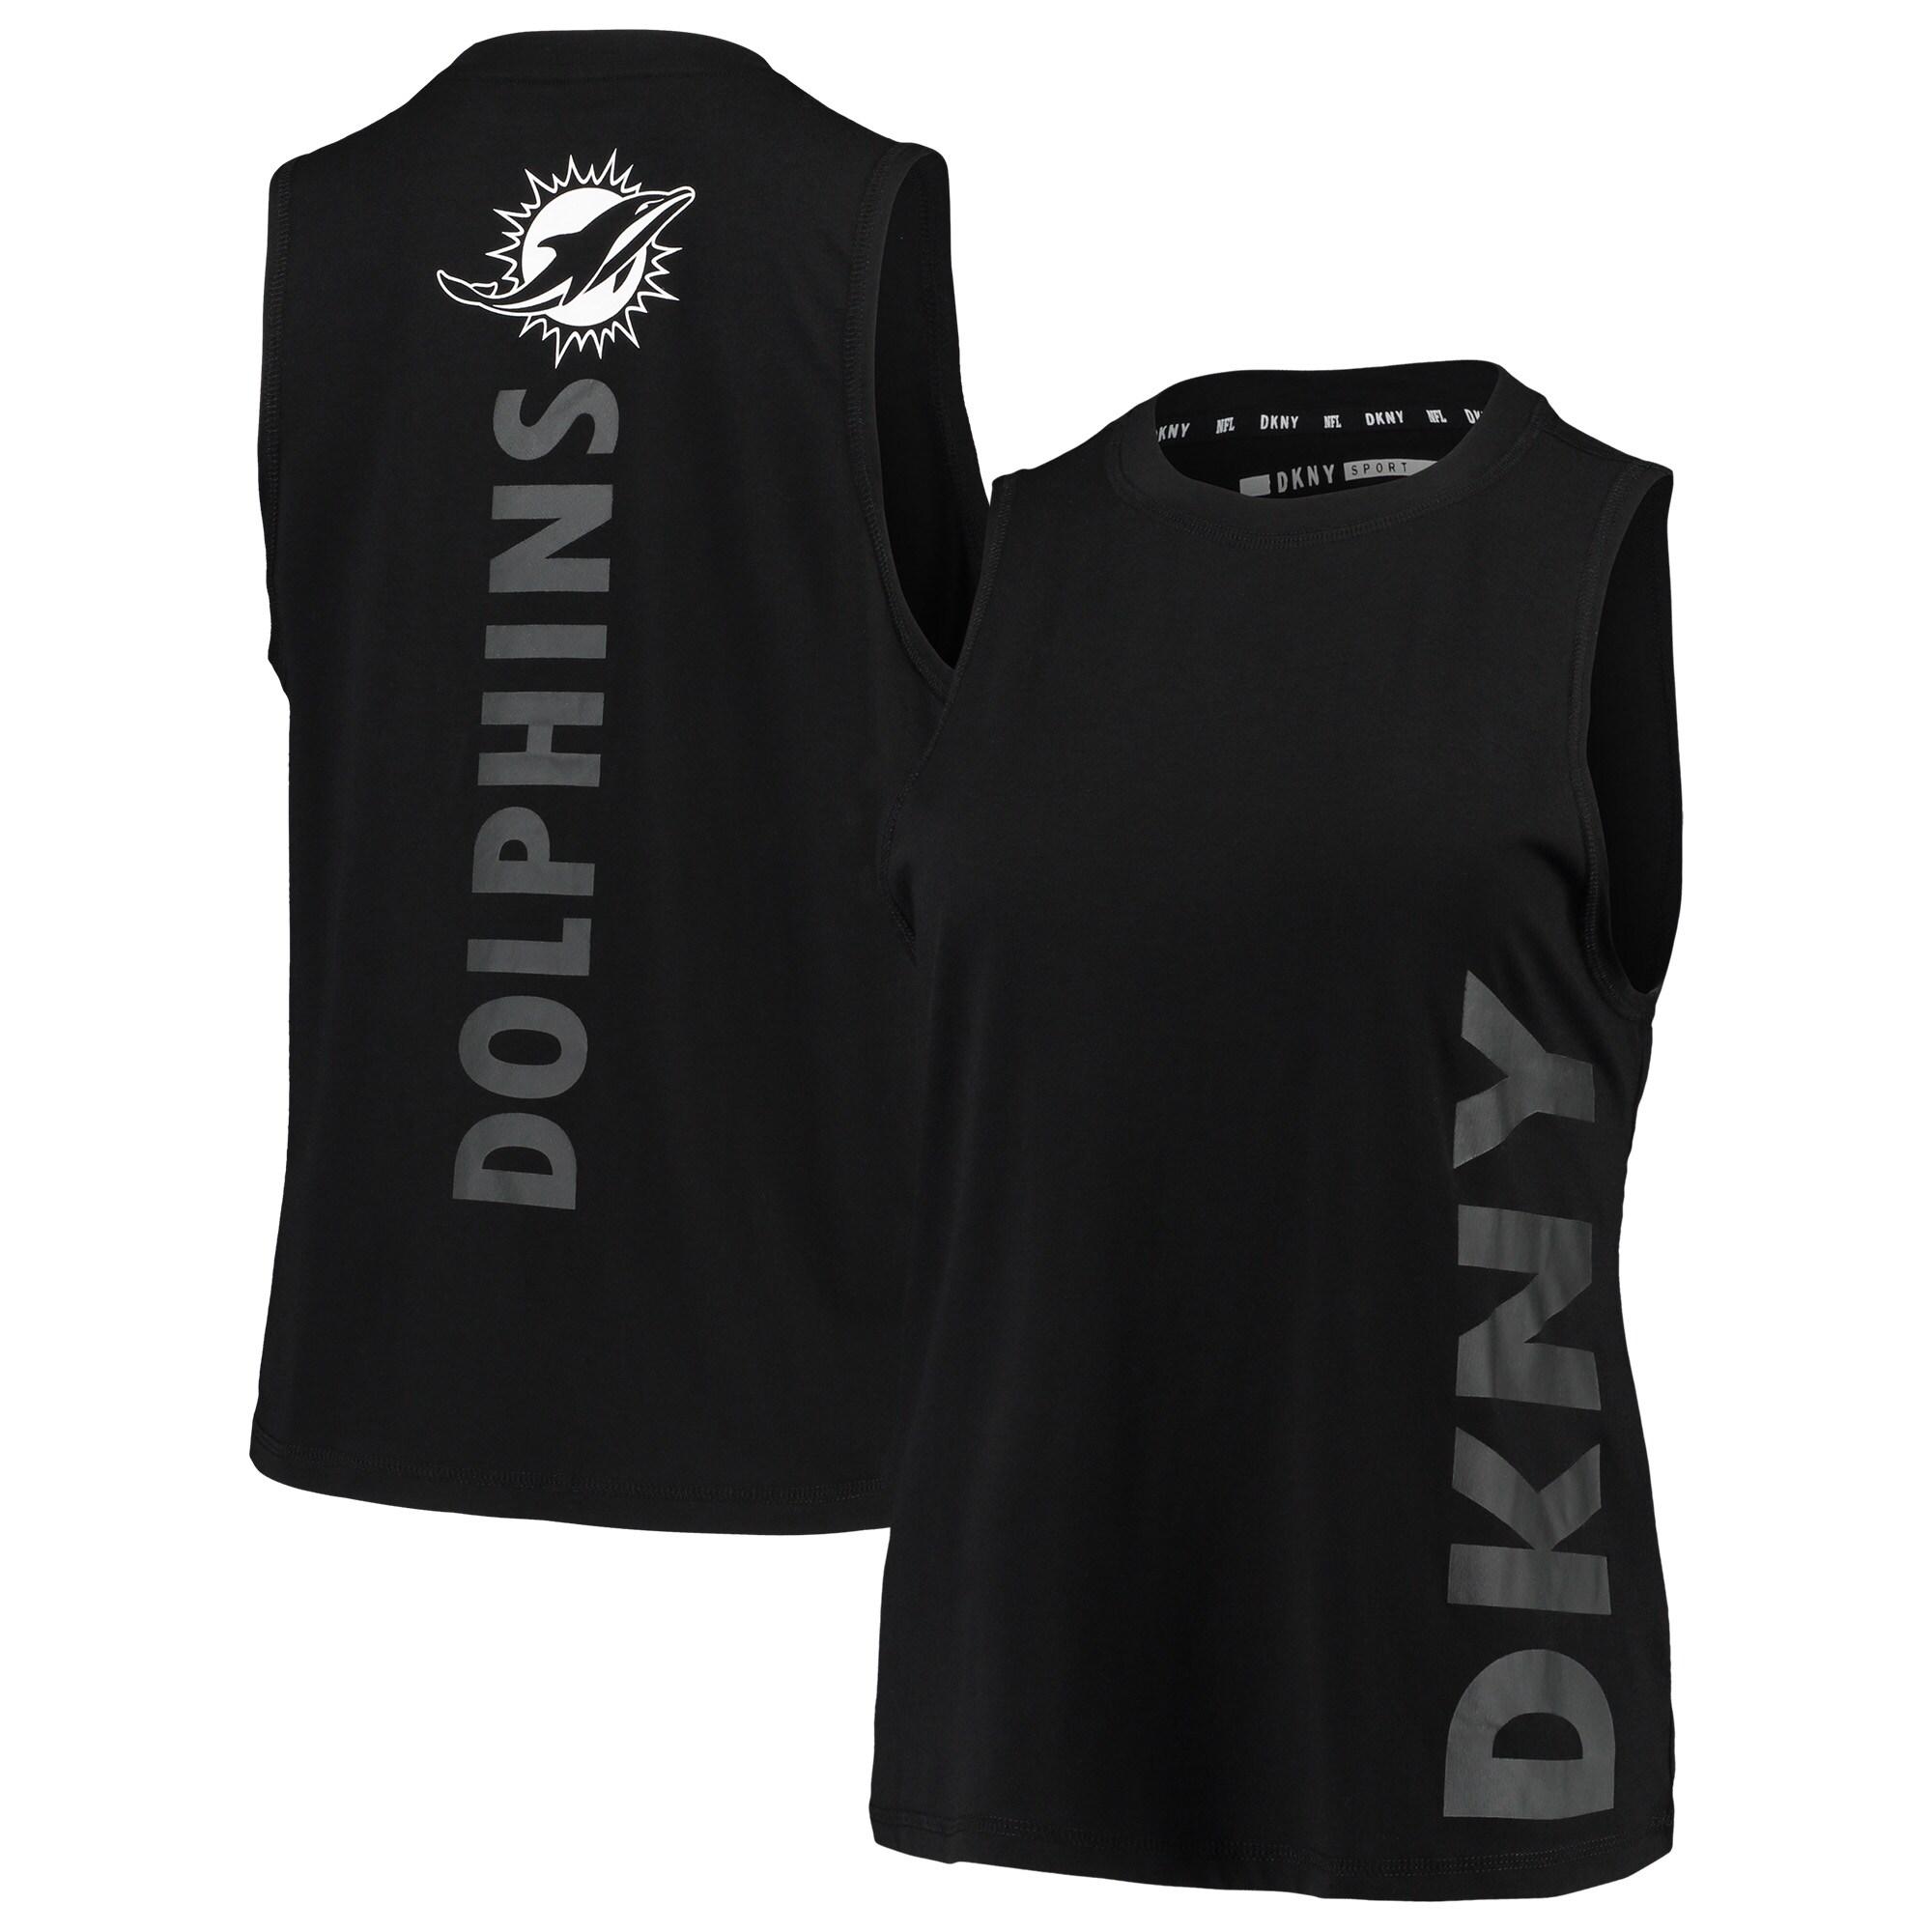 Miami Dolphins DKNY Sport Women's Olivia Tri-Blend Tank Top - Black